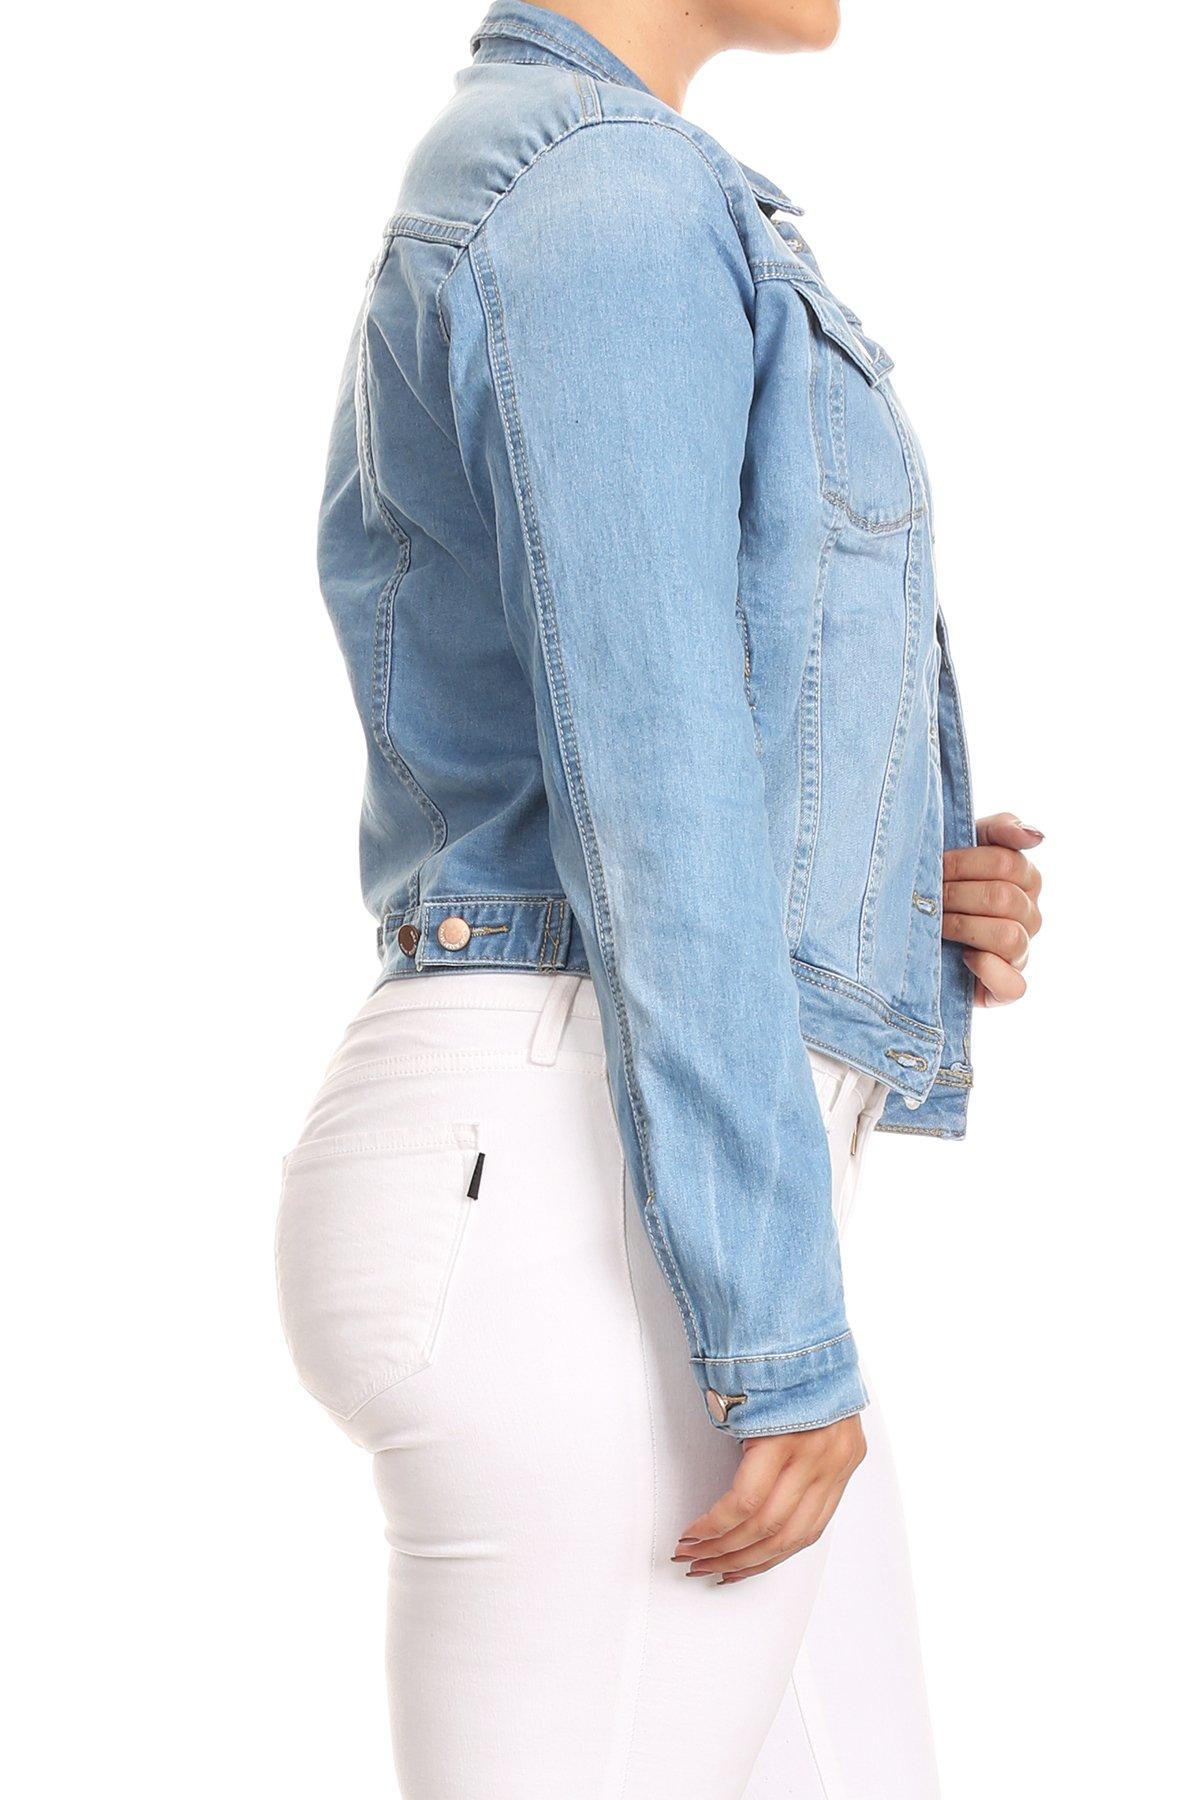 JKT102PS-Women-039-s-Plus-Size-Premium-Denim-Jackets-Long-Sleeve-Loose-Jean-Coats thumbnail 8